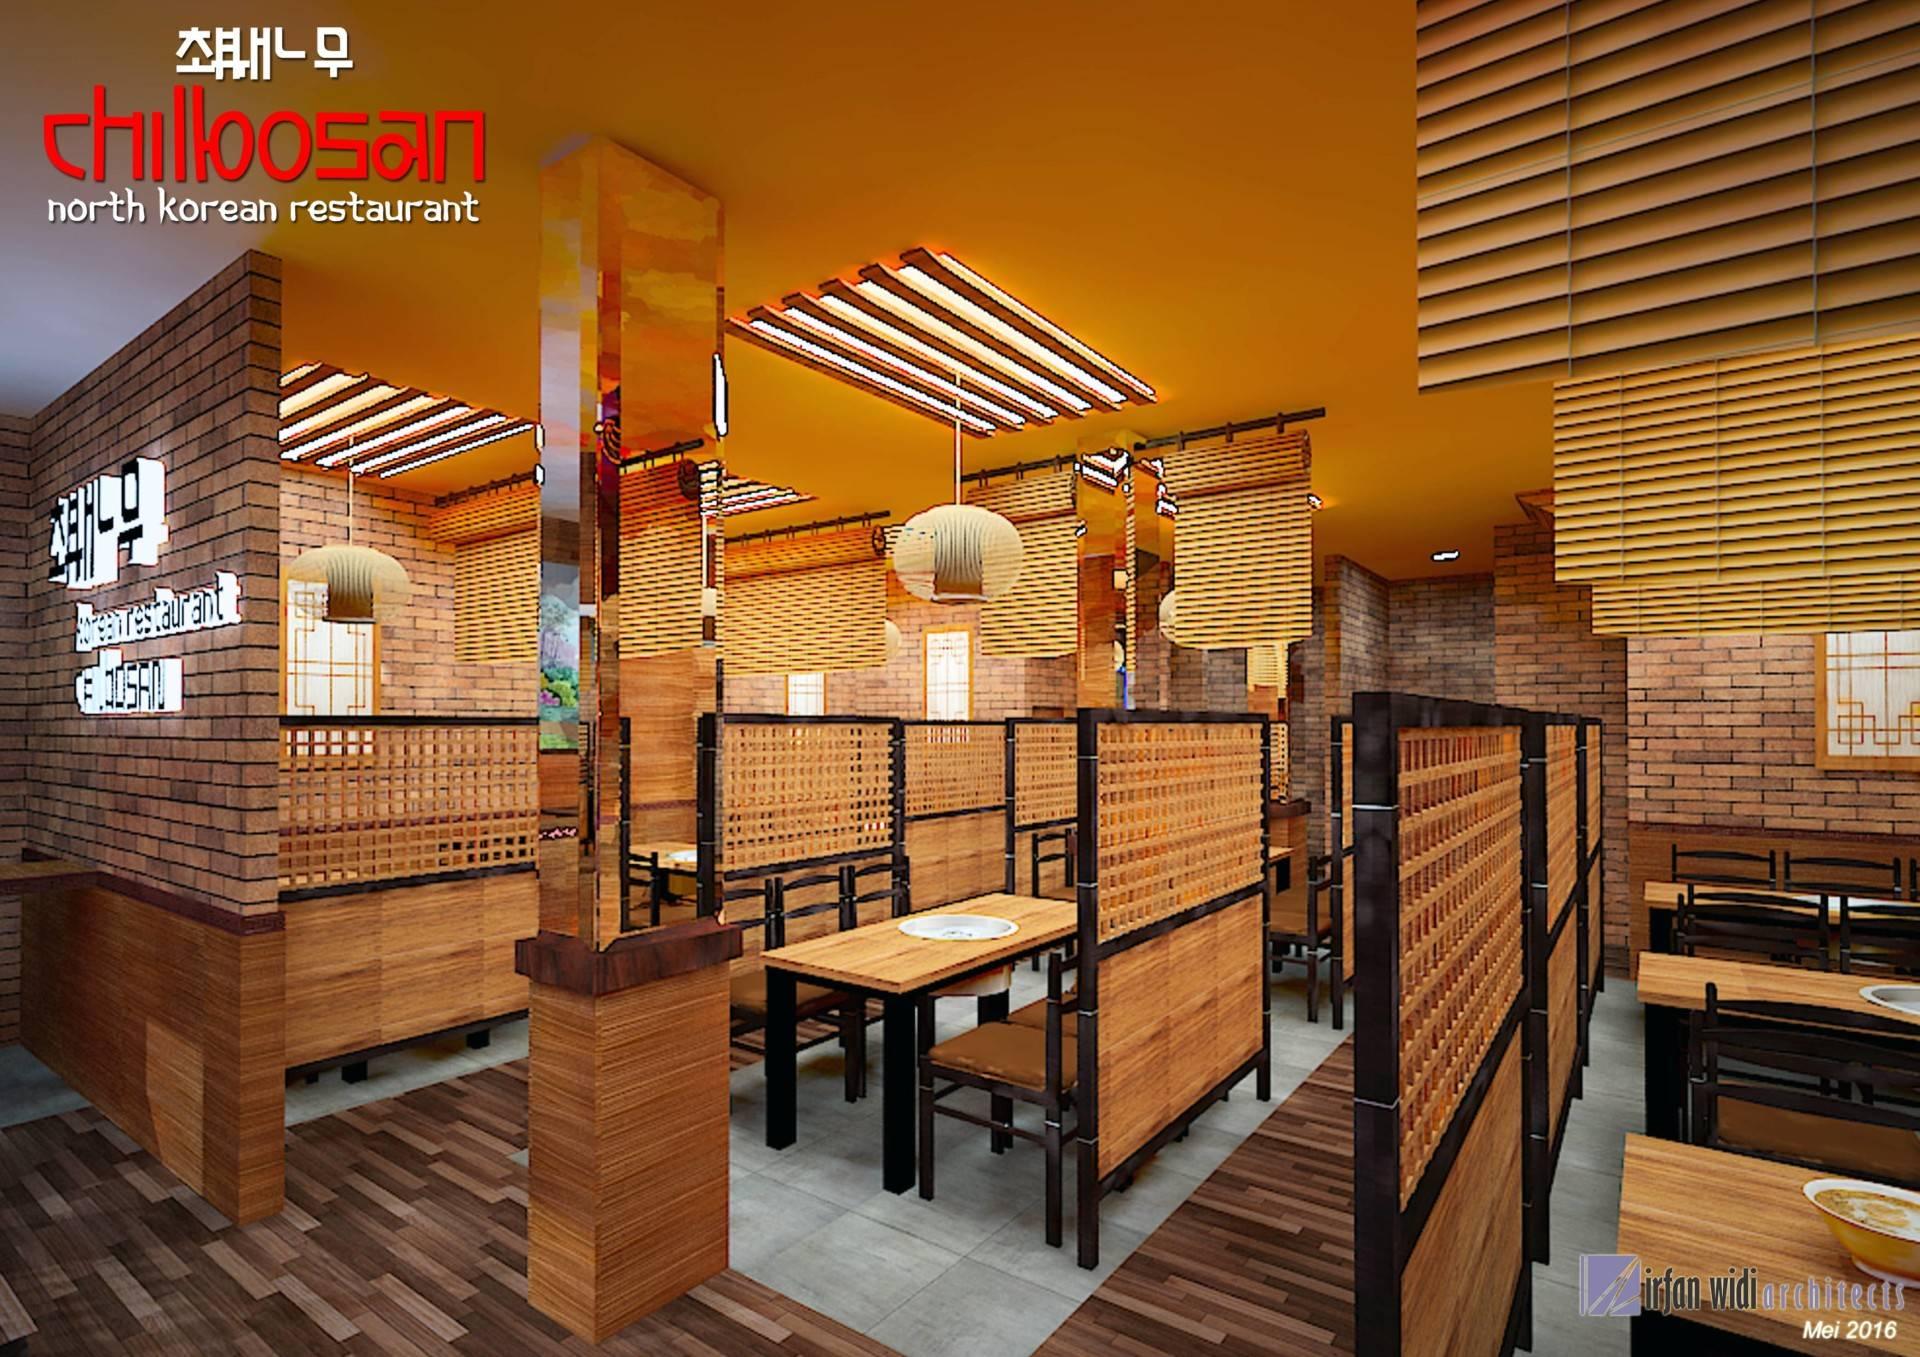 Irfanwidi Architects Chilbosan North Korean Restaurant At Kelapa Gading Kelapa Gading. Jakarta Utara Kelapa Gading. Jakarta Utara Revisichilbosan-Lt11 Tradisional  5227